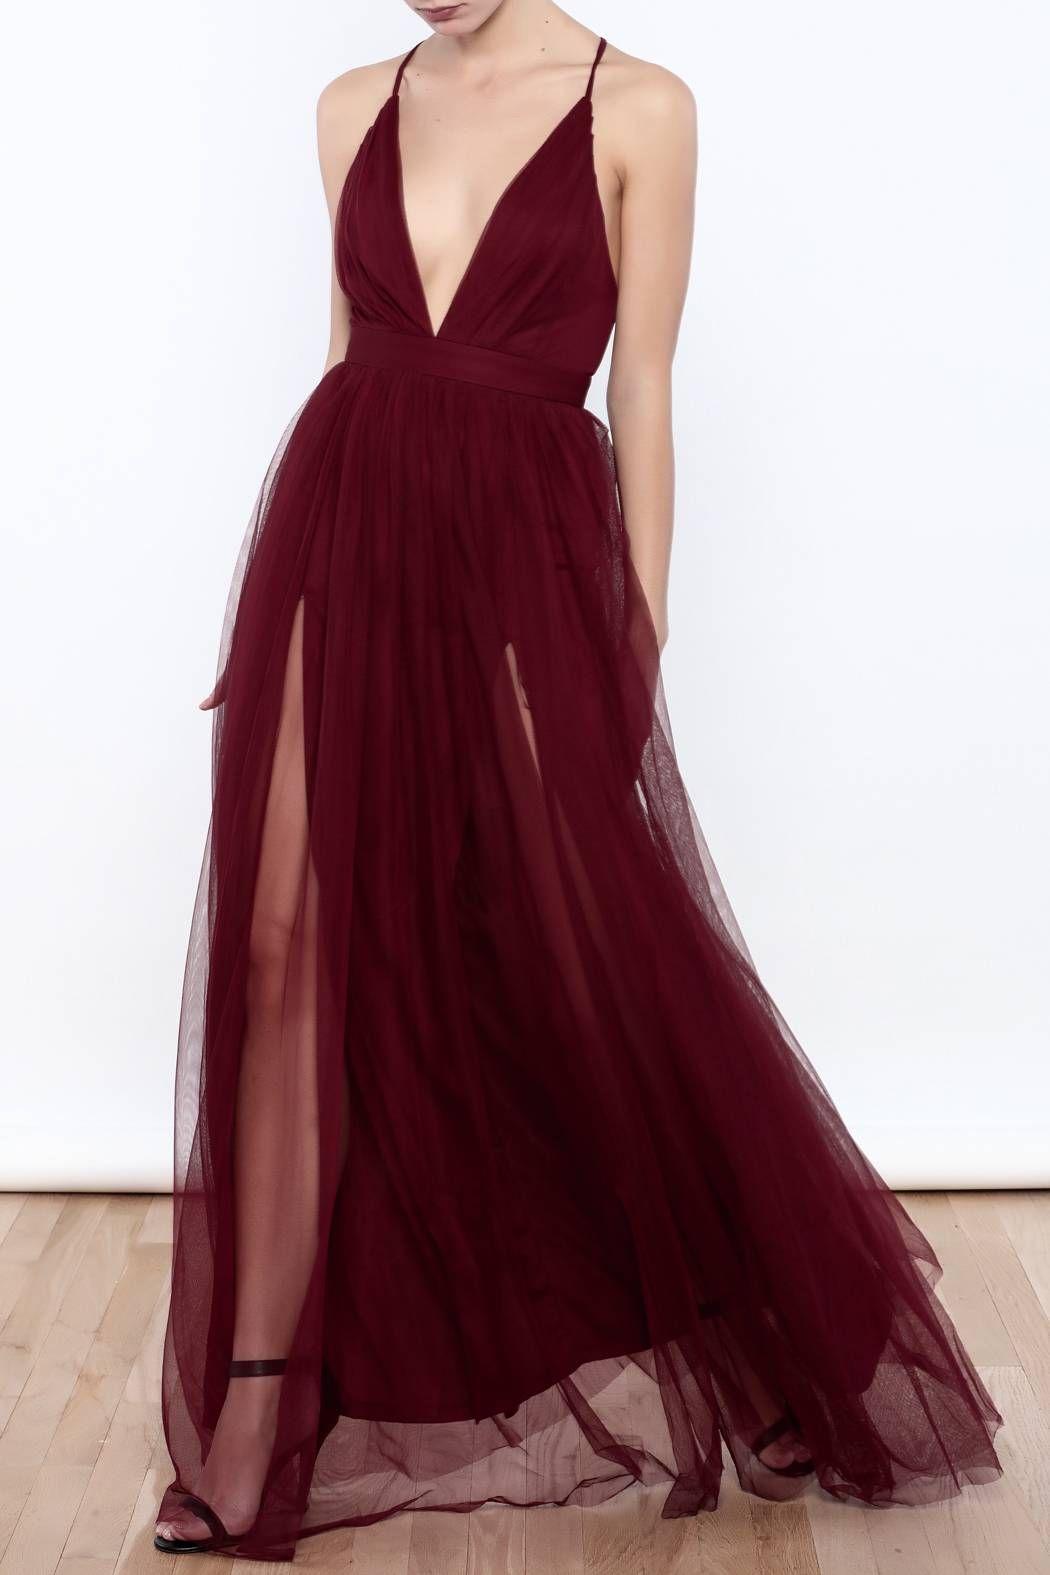 63eba0ffc luxxel Tulle Maxi Dress - Front Full Image Vestido De Festa Vinho, Vestido  Vinho Longo